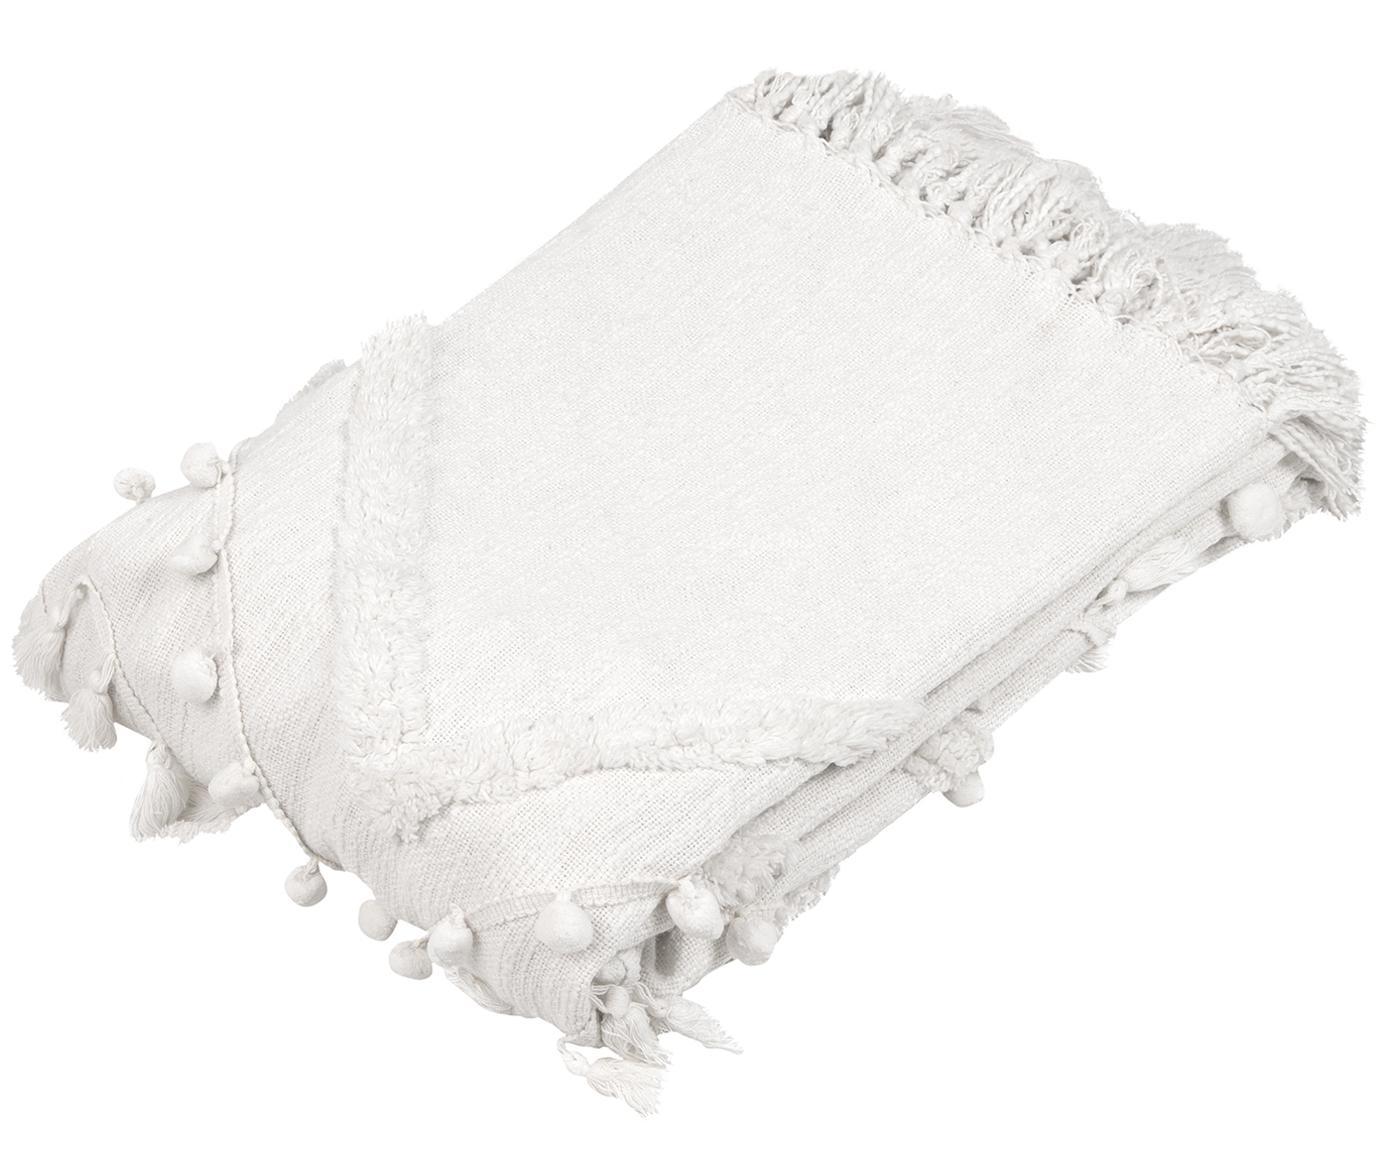 Katoenen plaid Pana, 100% katoen, Crèmewit, 130 x 170 cm